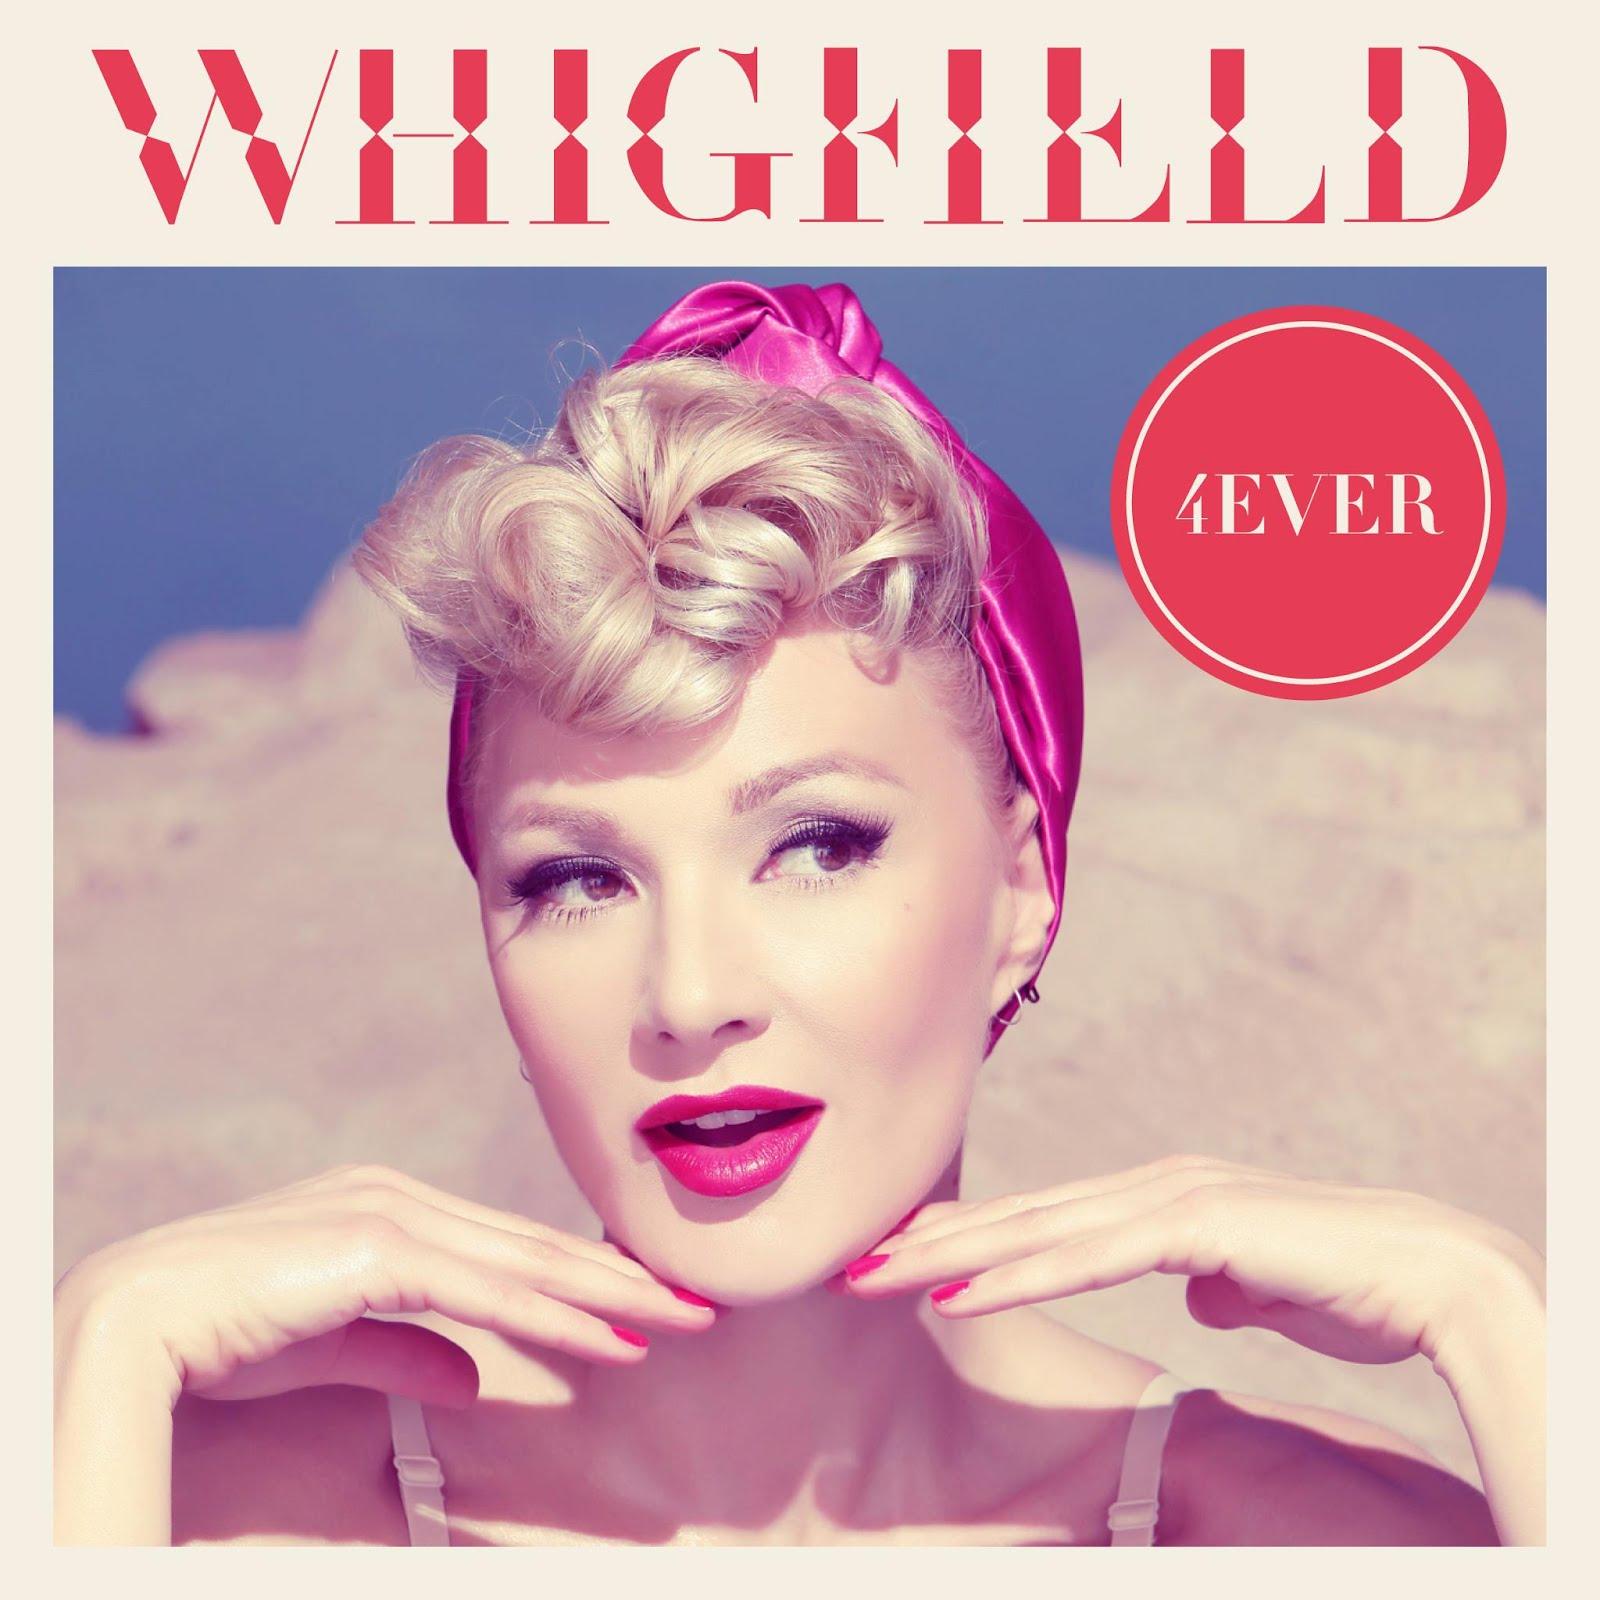 Haiducii Nude eurodance blog: whigfield